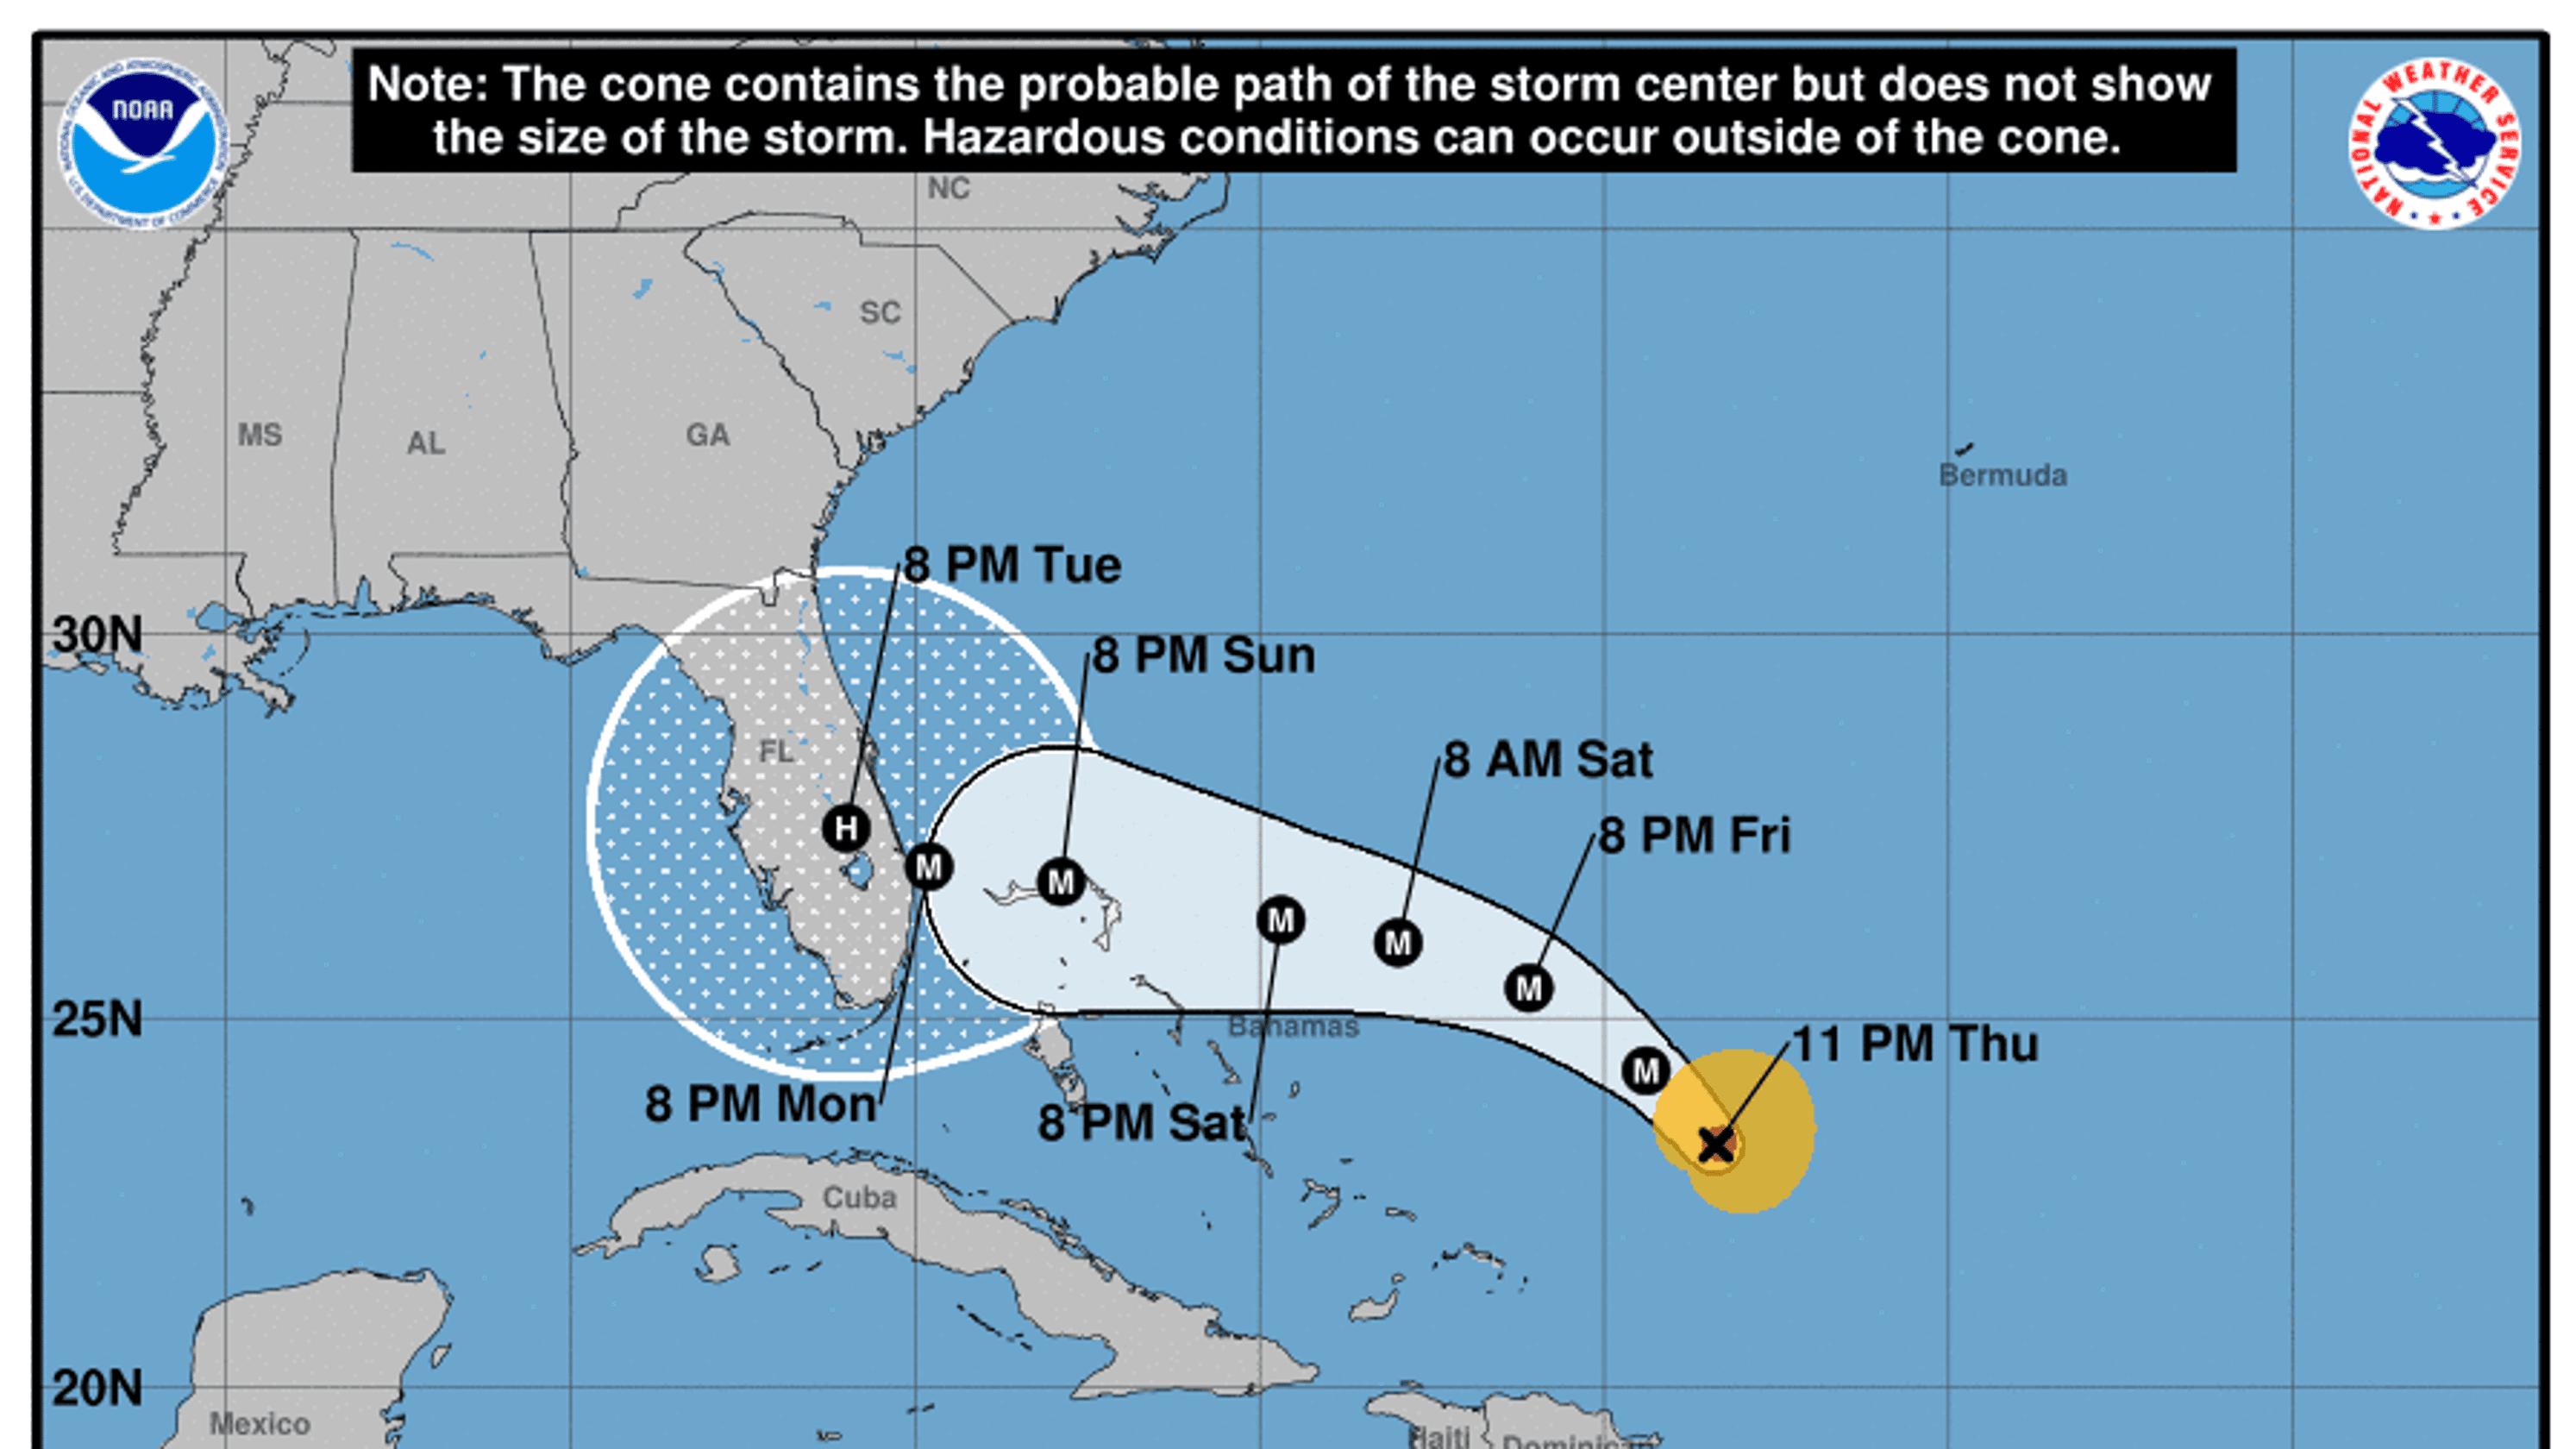 Hurricane Dorian forecast to become major hurricane on Friday on